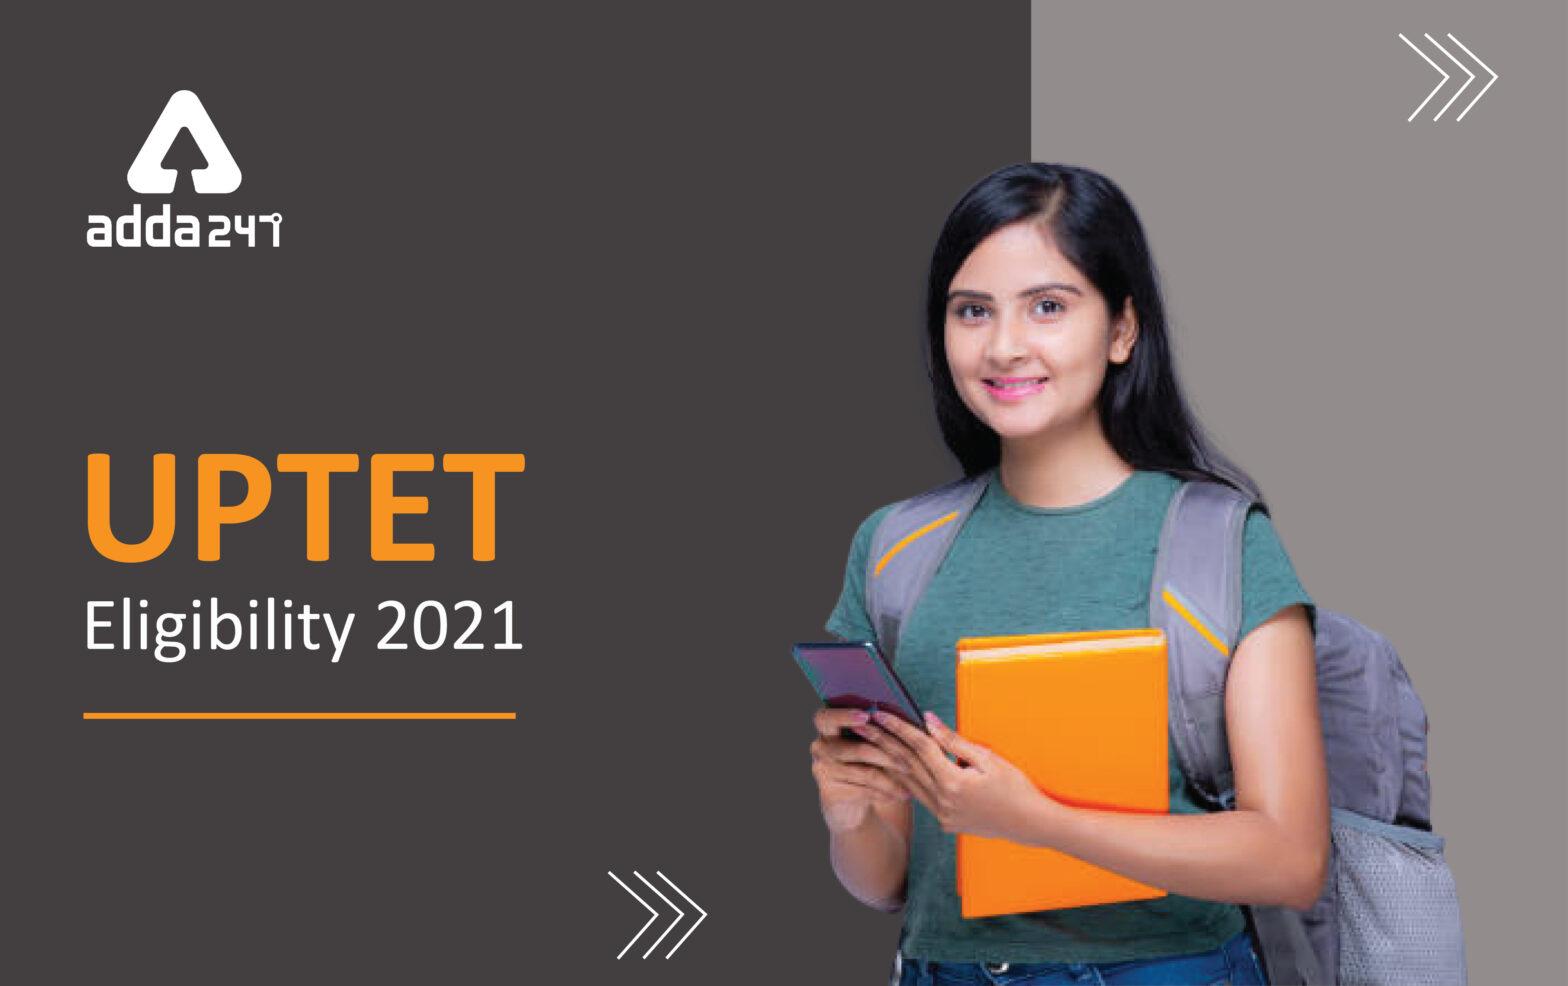 UPTET Eligibility 2021: Check Exam Dates, Age Limit & Other Details_40.1